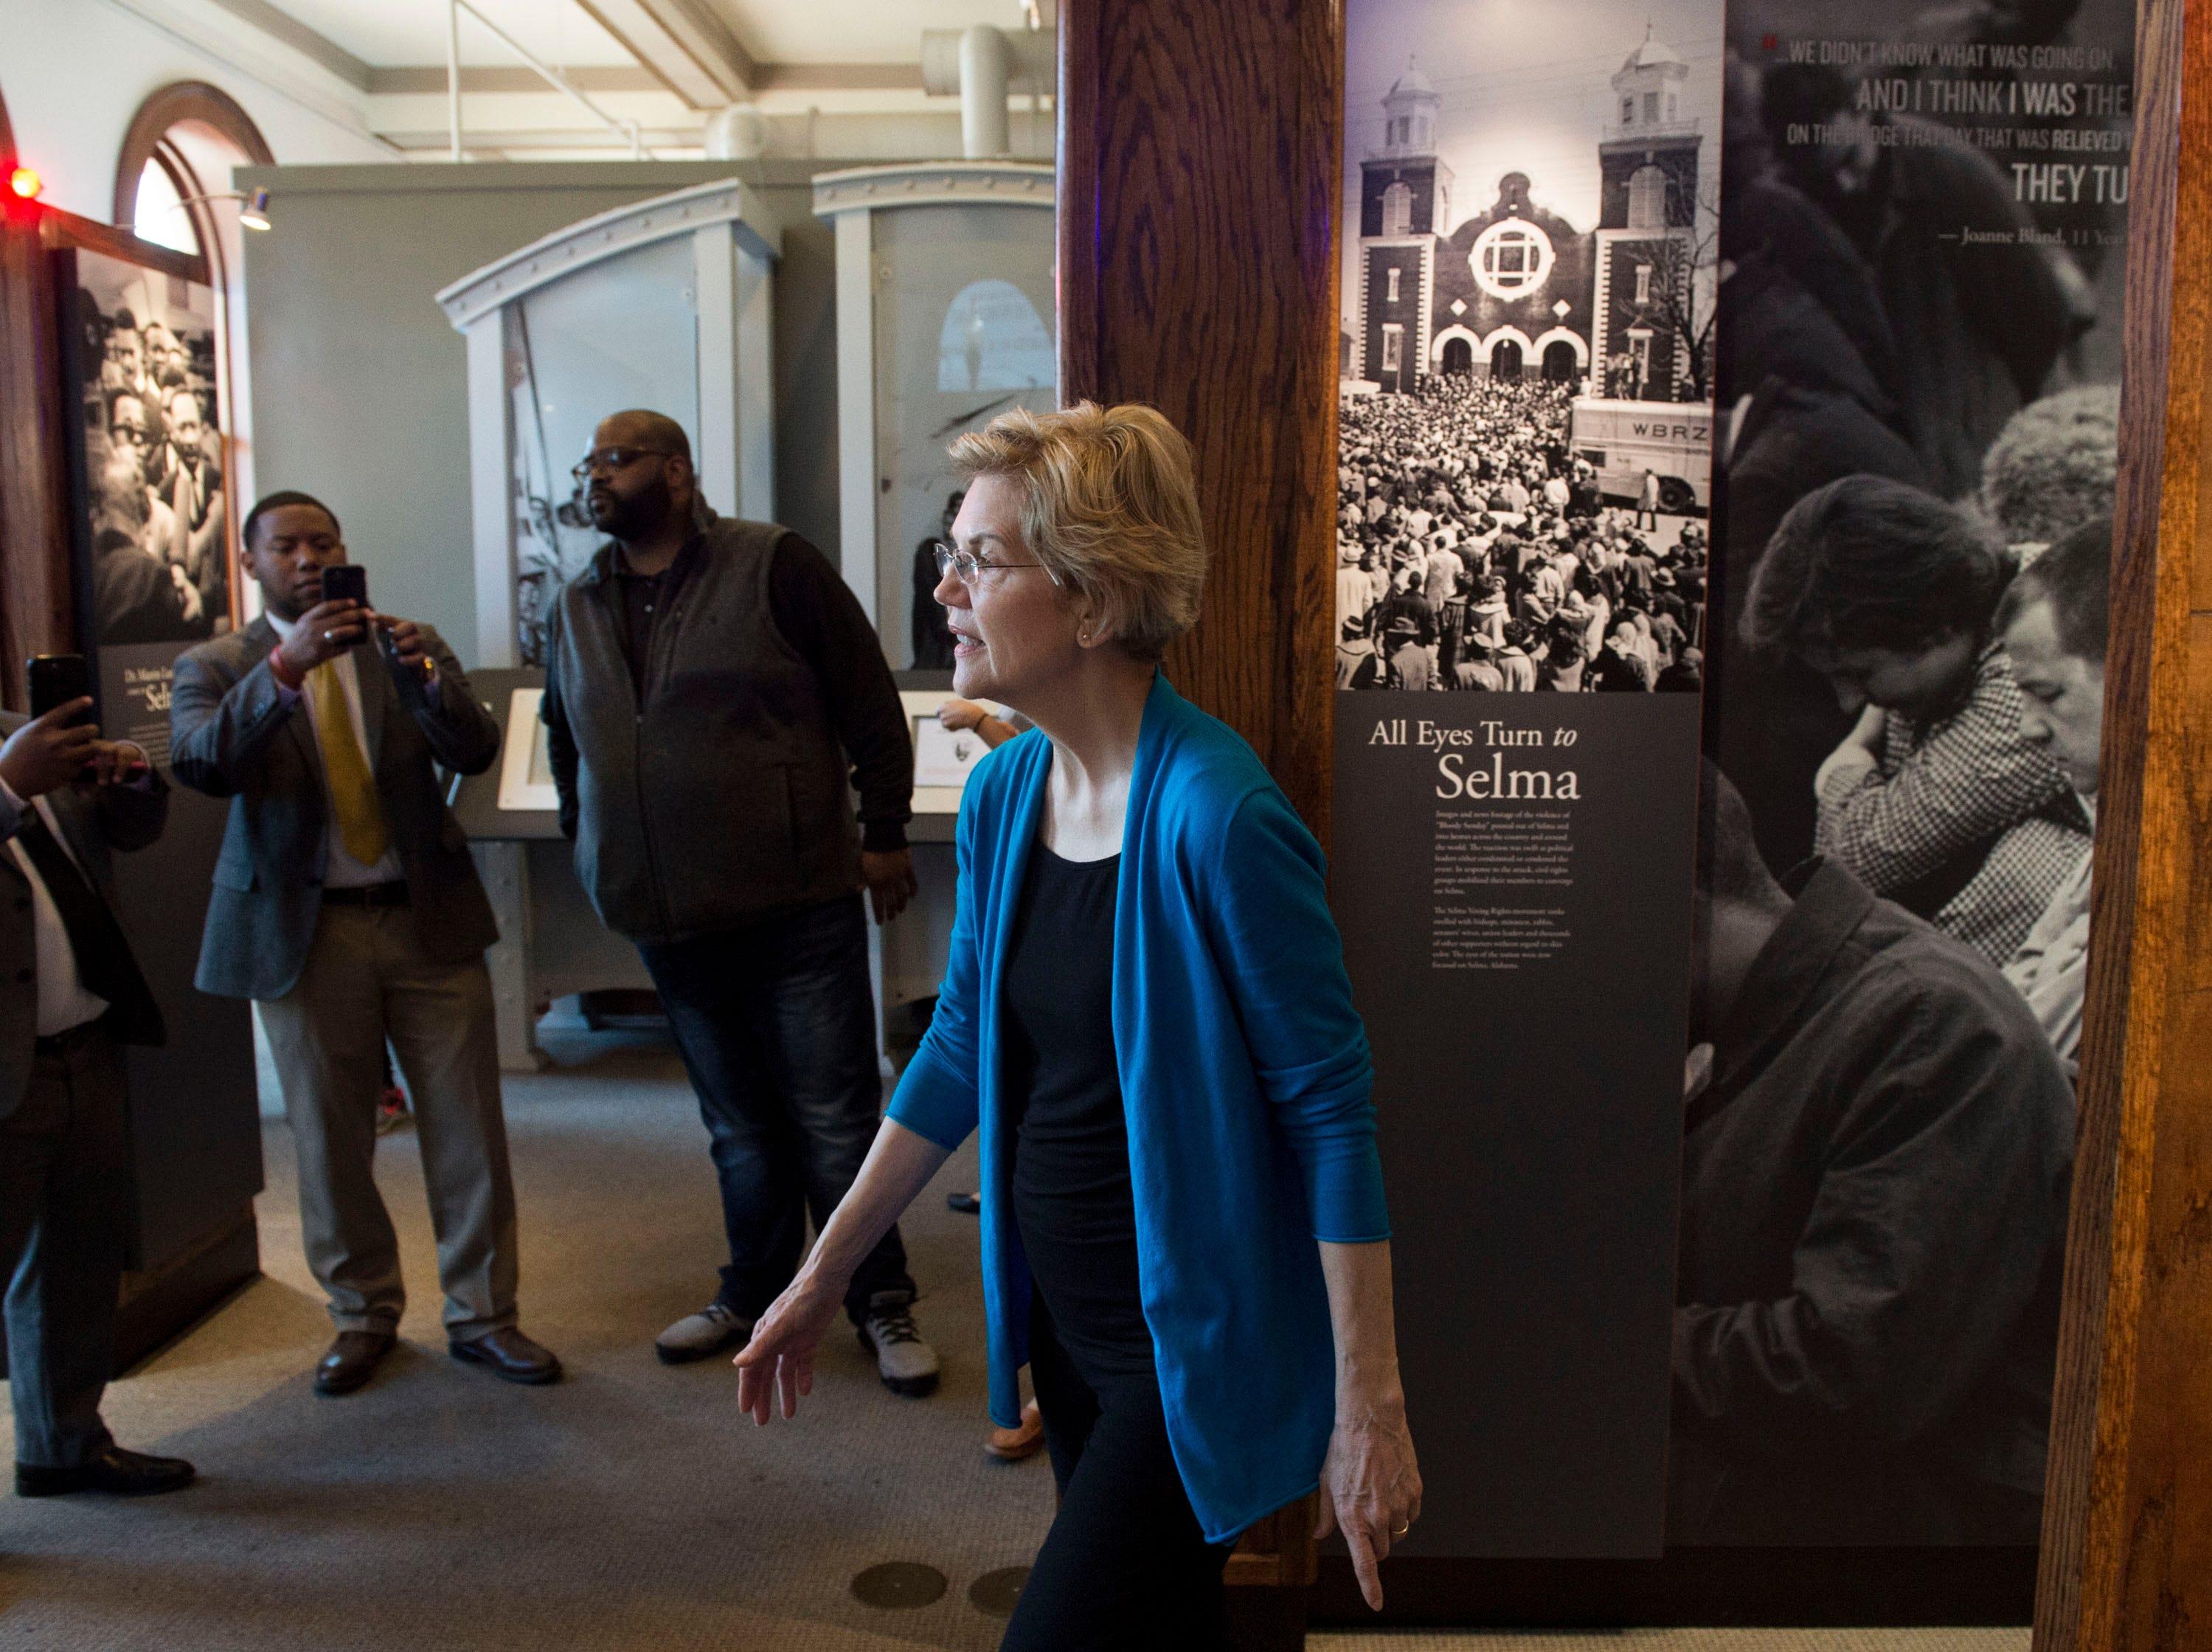 Sen. Elizabeth Warren looks through the exhibits at the Selma Interpretive Center in Selma, Ala., on Tuesday, March 19, 2019.